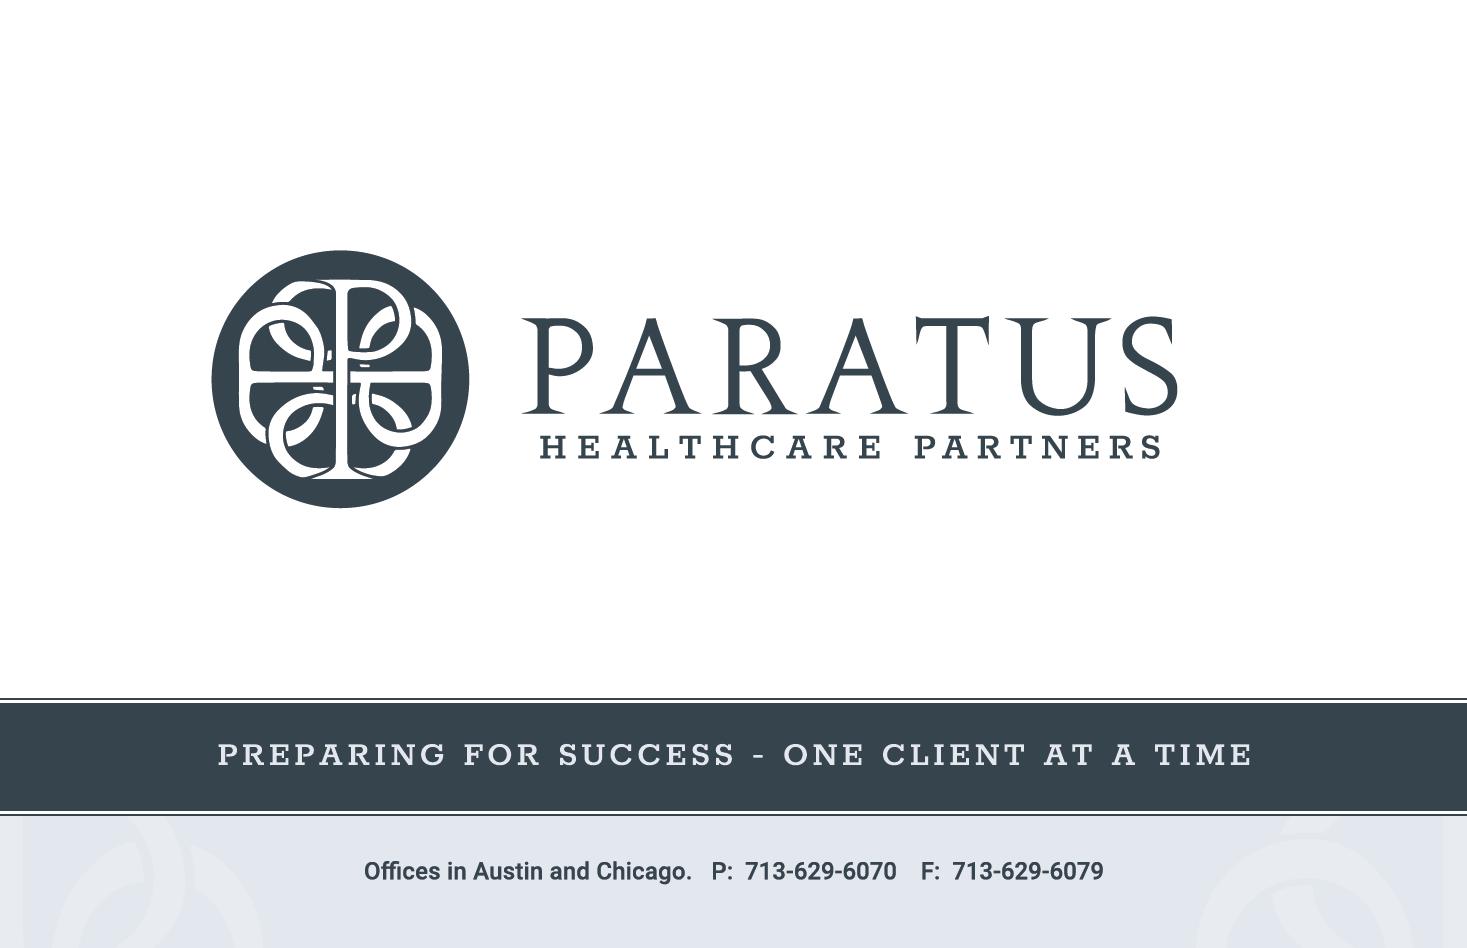 Paratus Healthcare Partners Logo